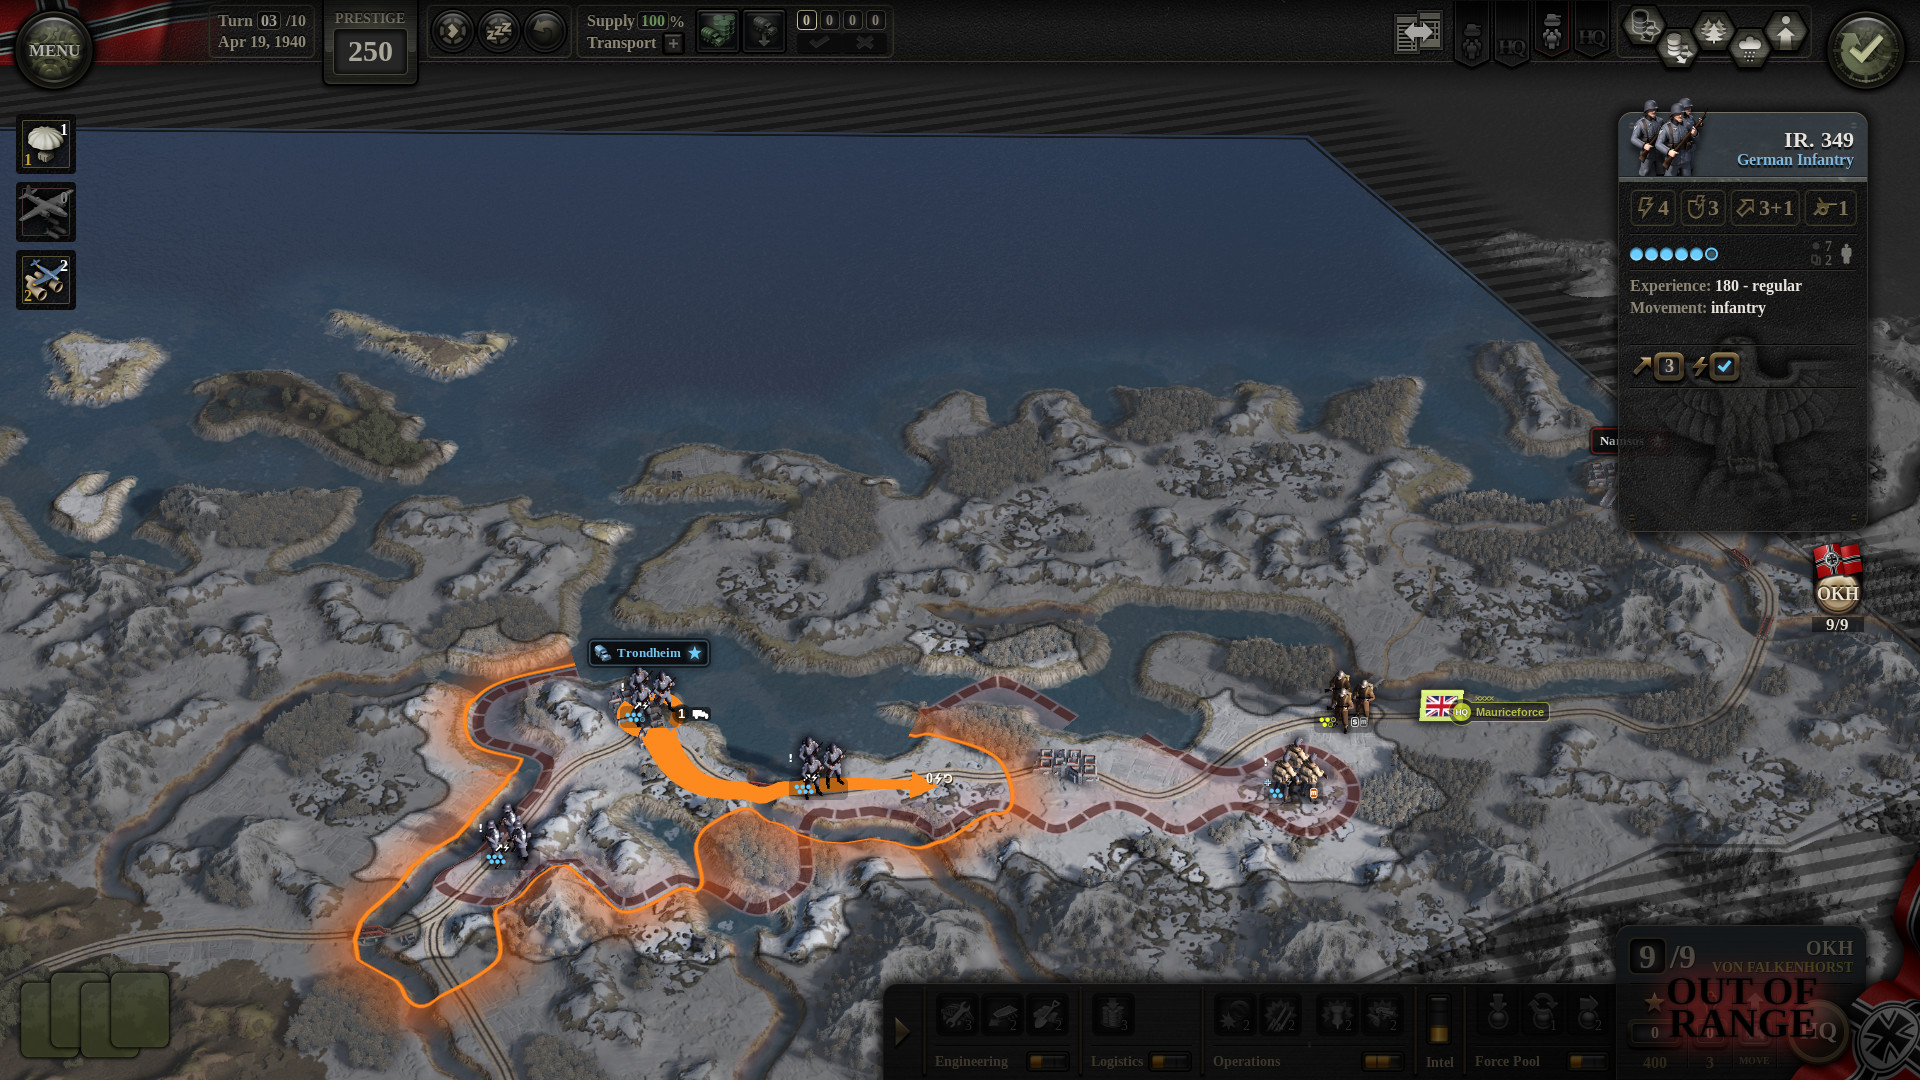 Unity of Command II - Blitzkrieg Fiyat Karşılaştırma